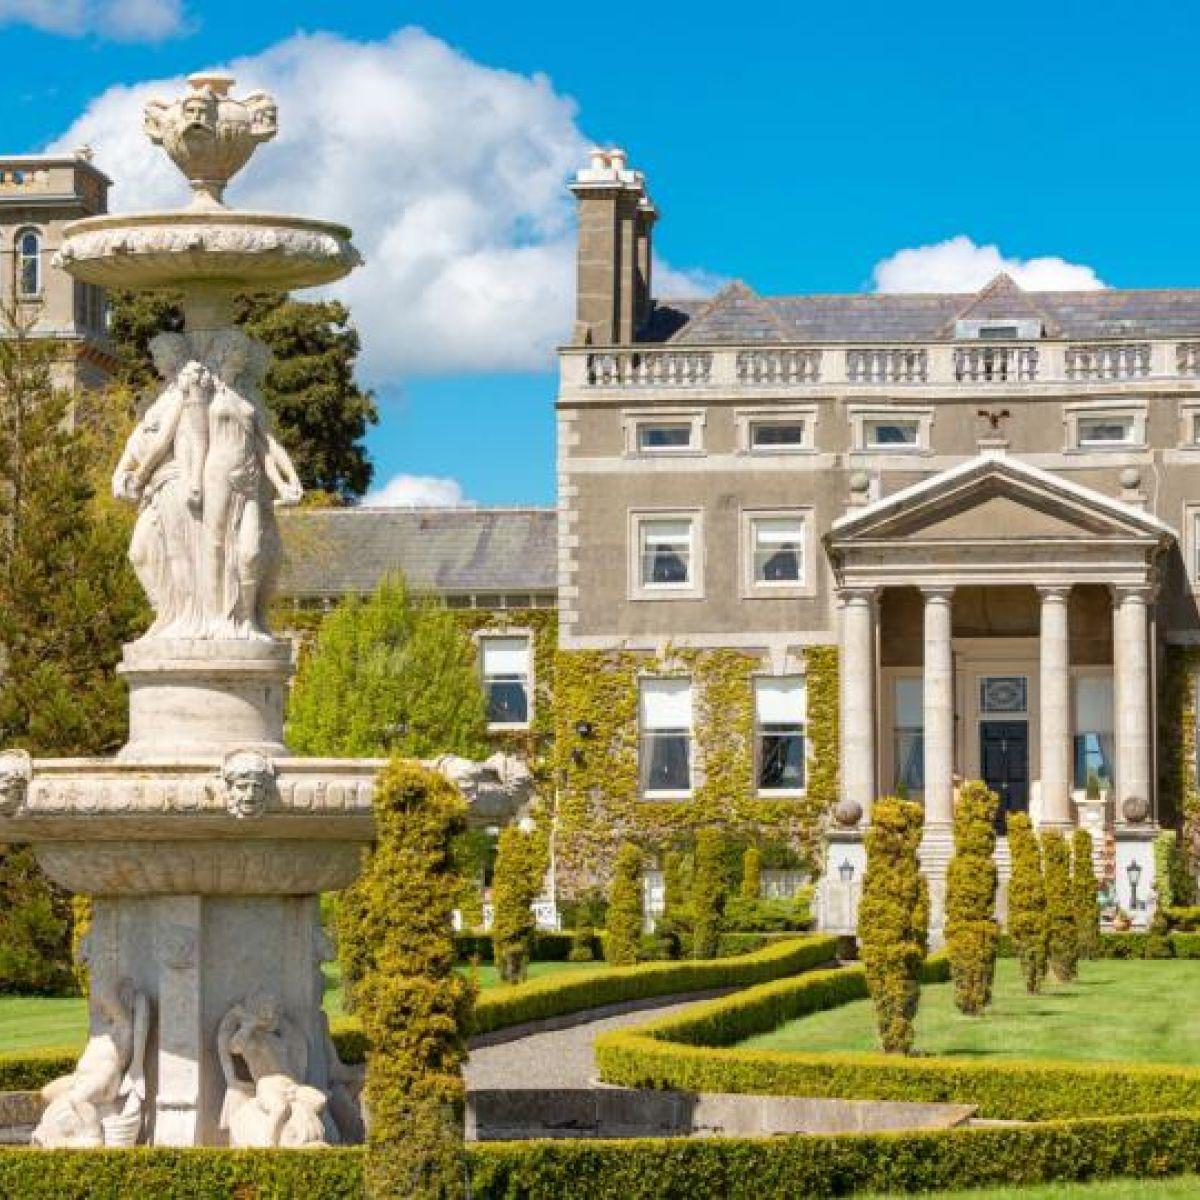 Corballis Golf Links in Donabate, County Dublin, Ireland   Golf